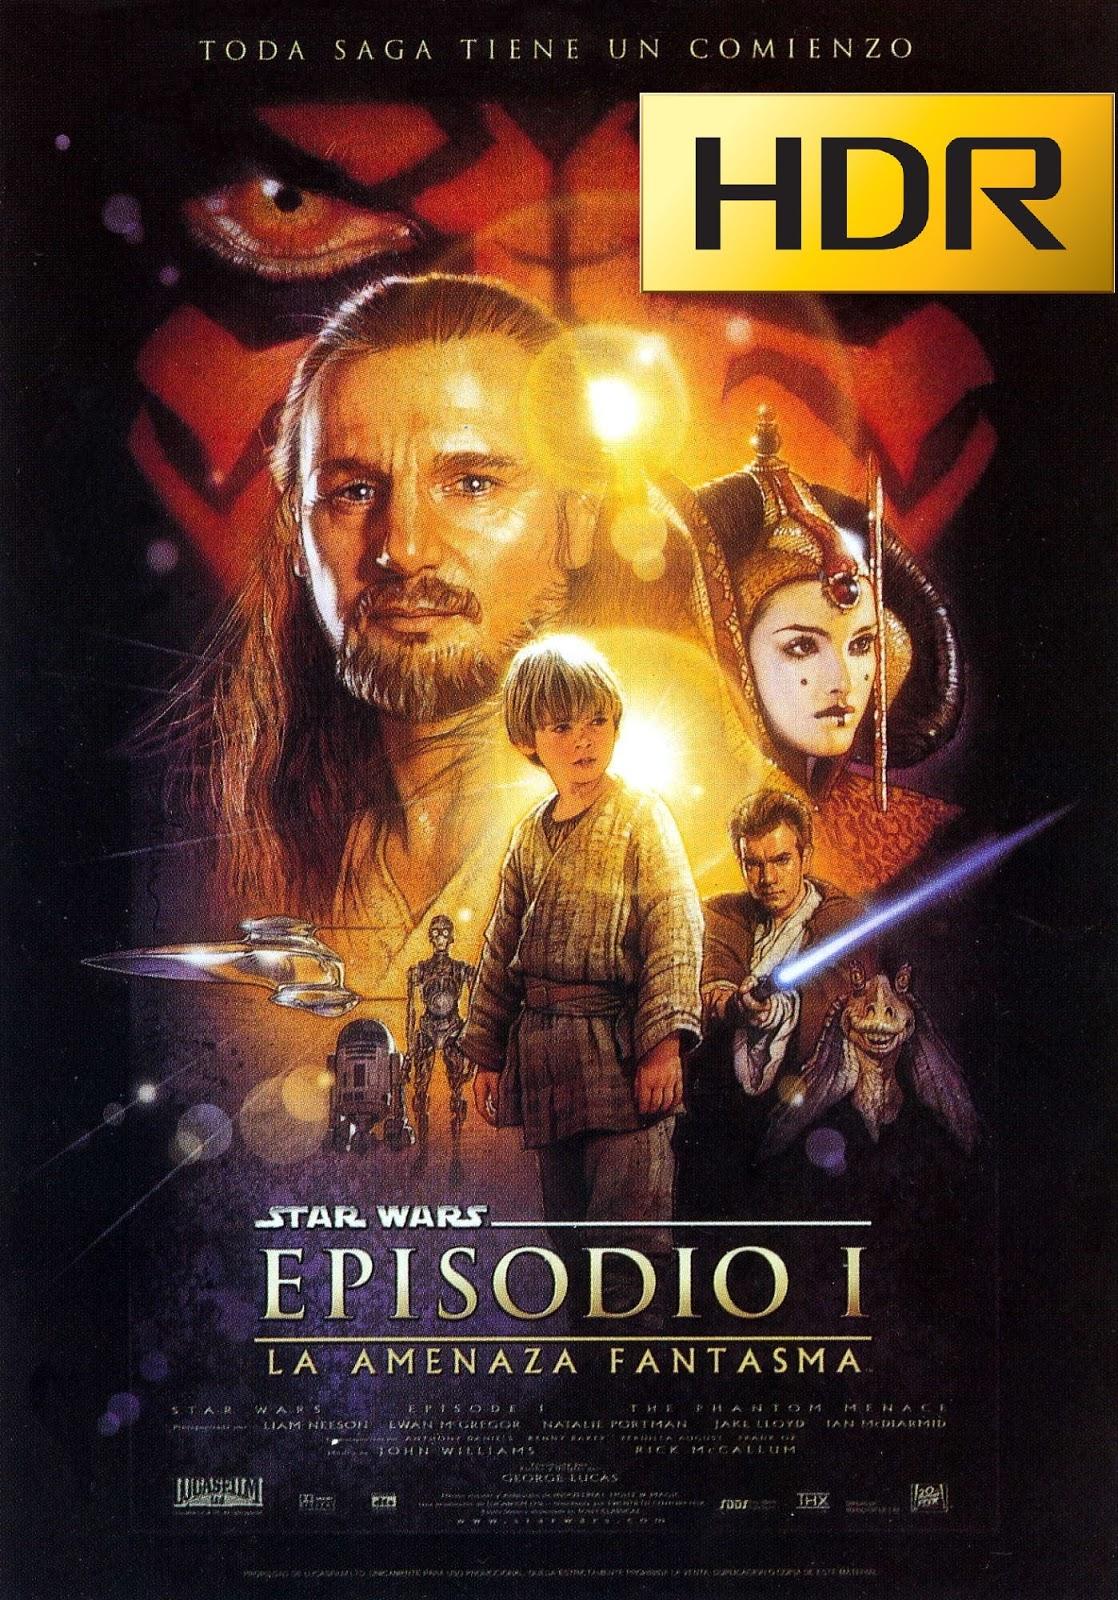 Star Wars: Episodio I (1999) 4K UHD HDR Webrip Latino